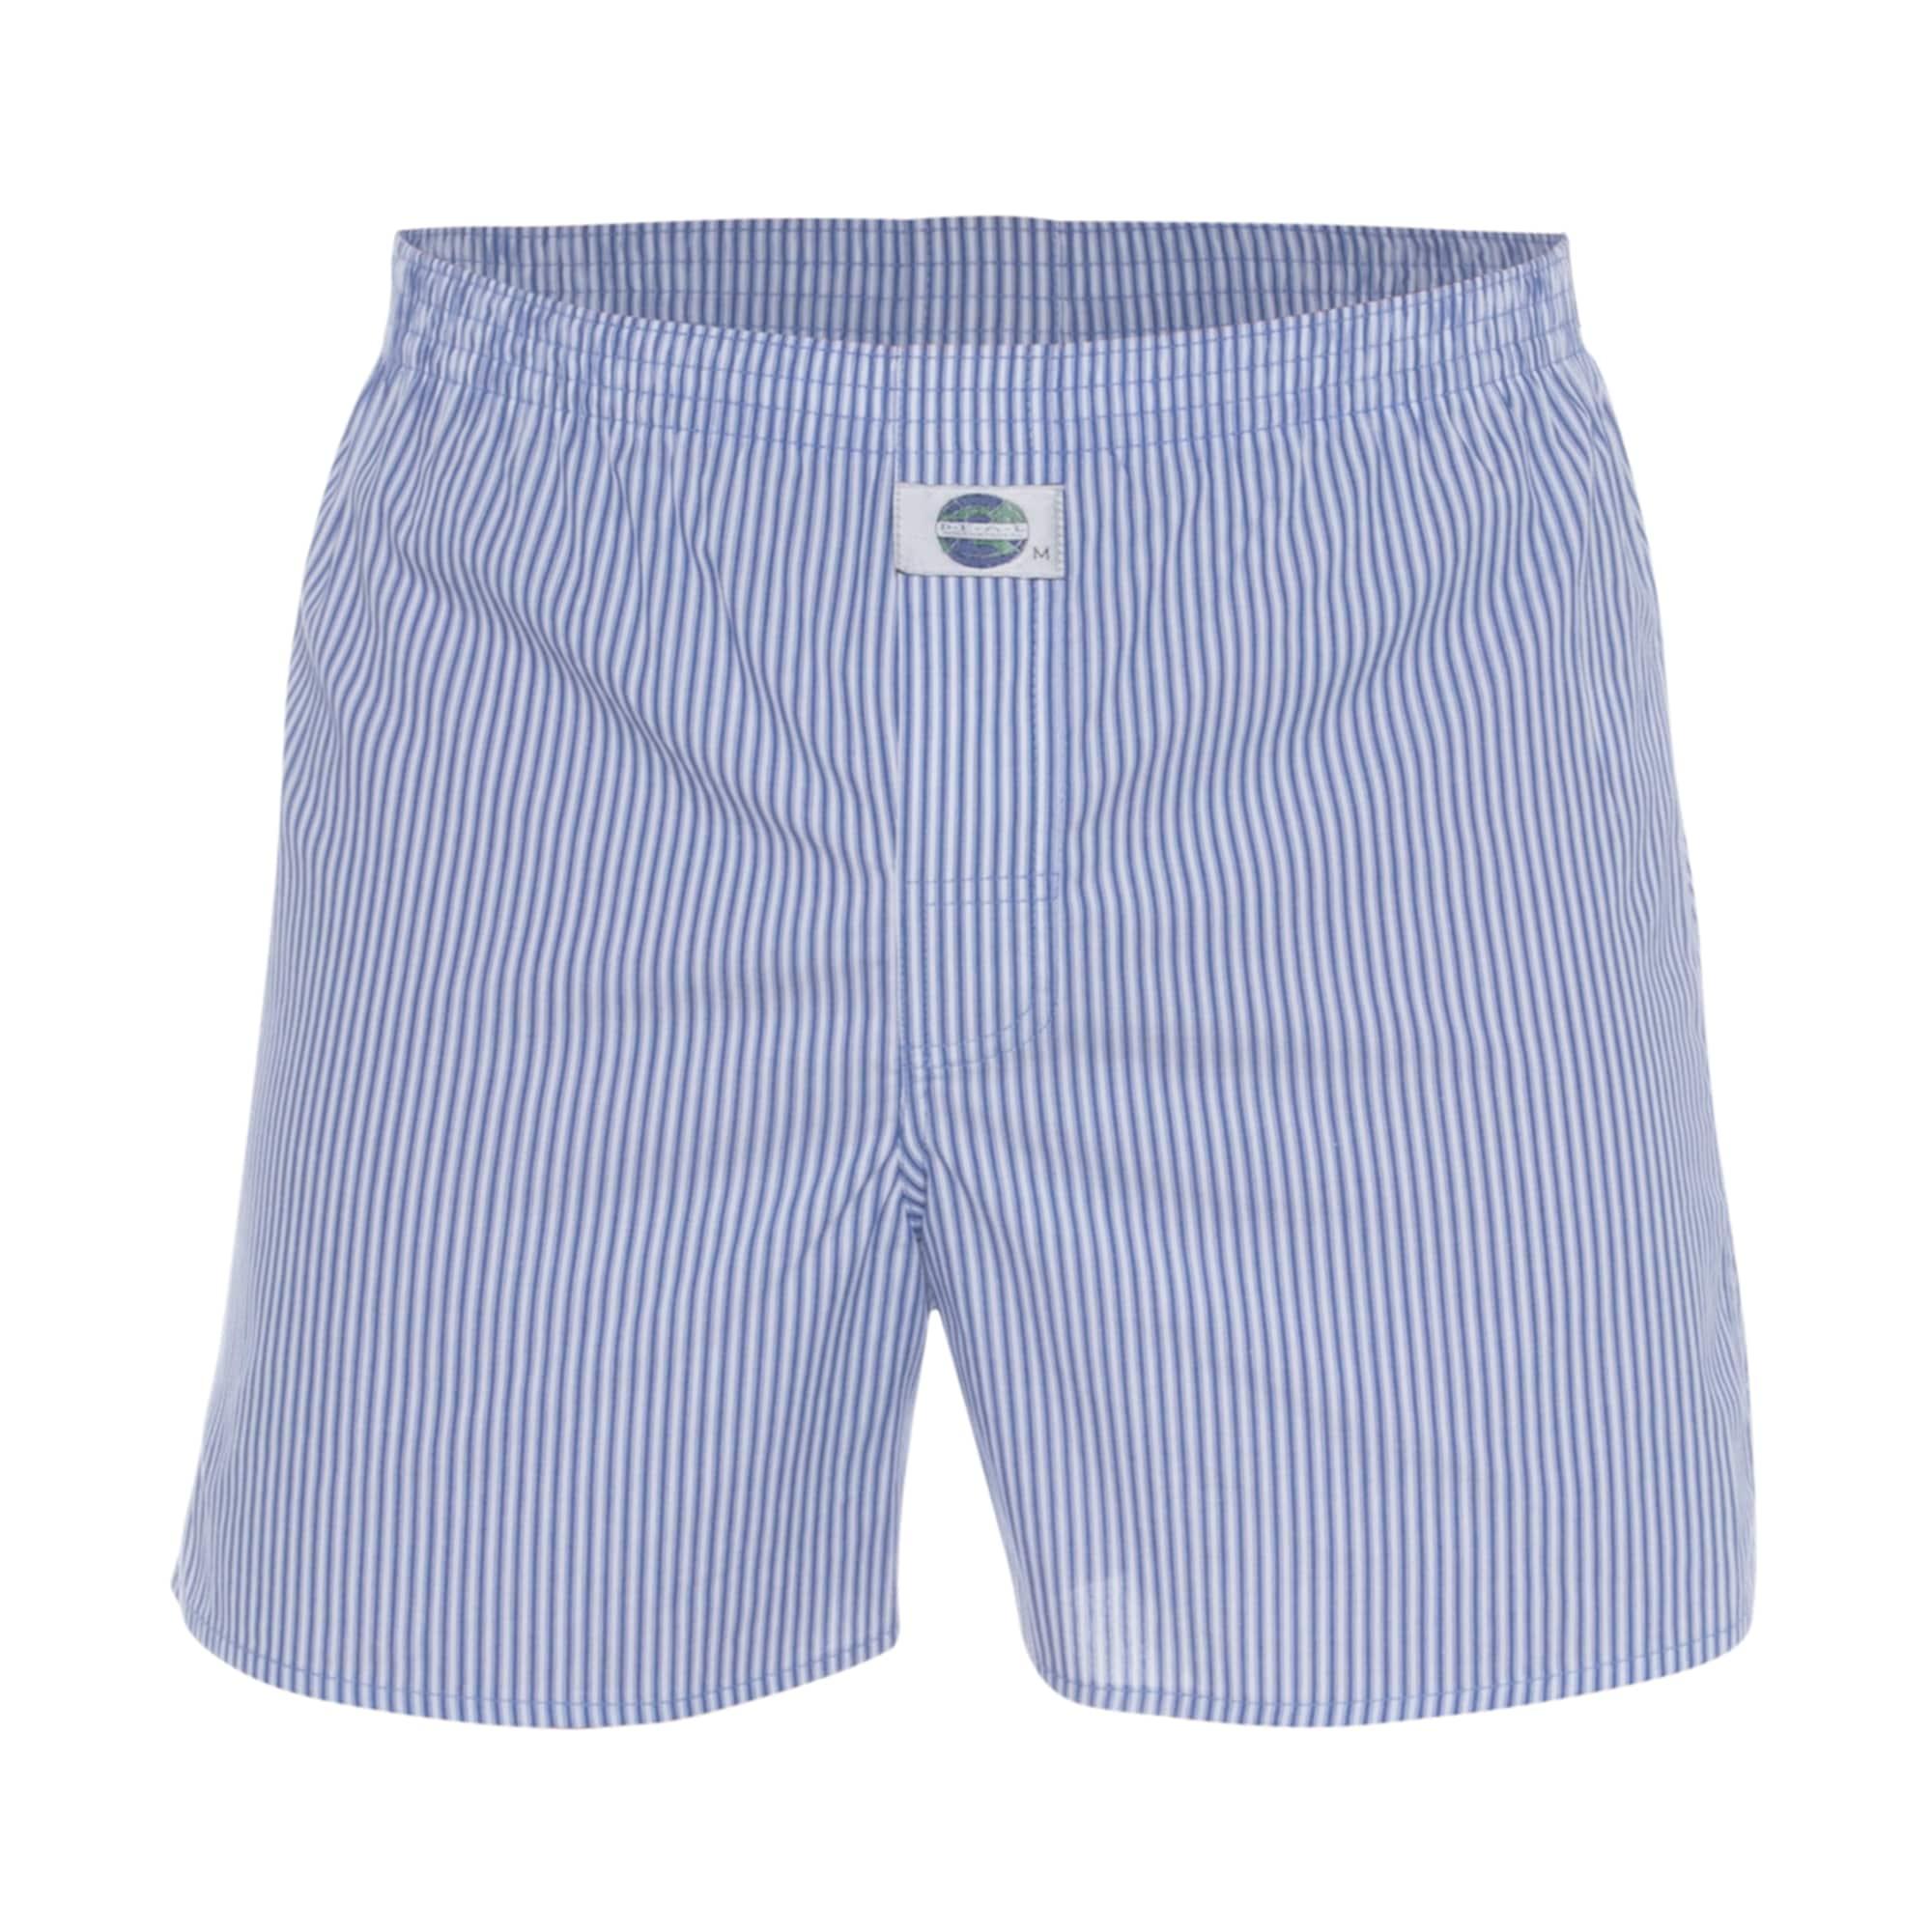 Boxerky Stripe modrá bílá D.E.A.L International